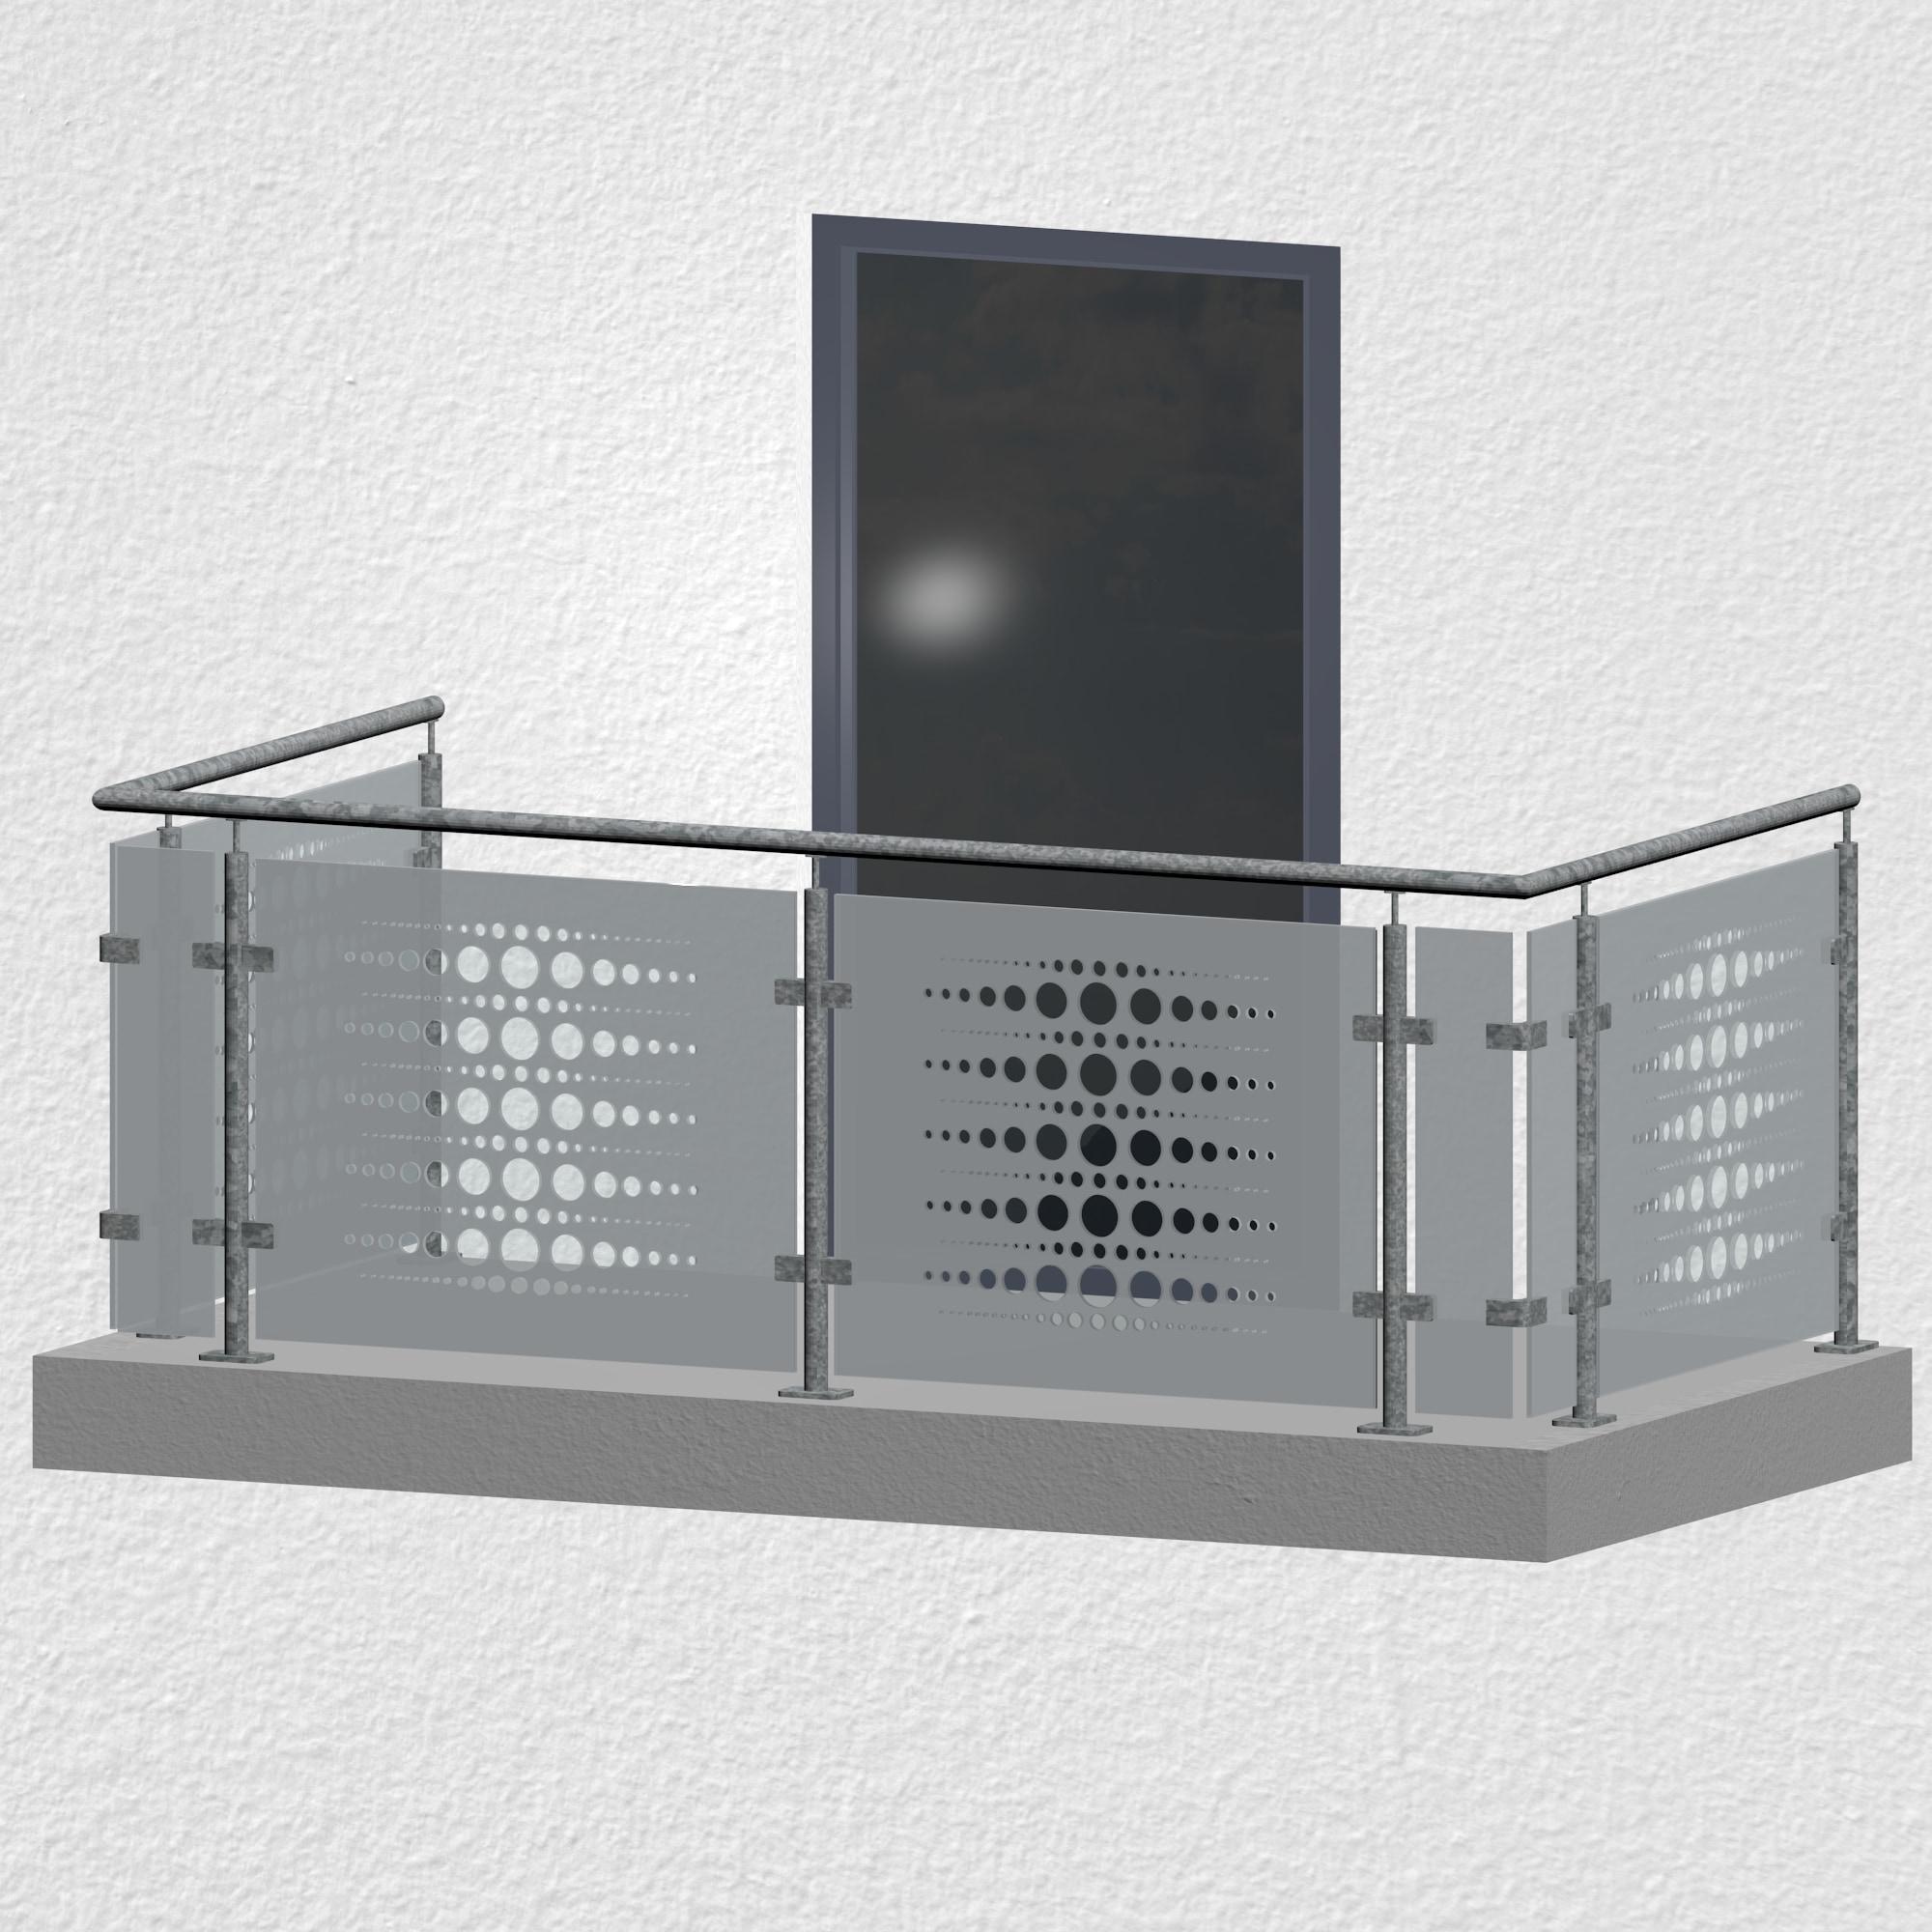 Balkongeländer verzinkt Designglas PE 2 MO